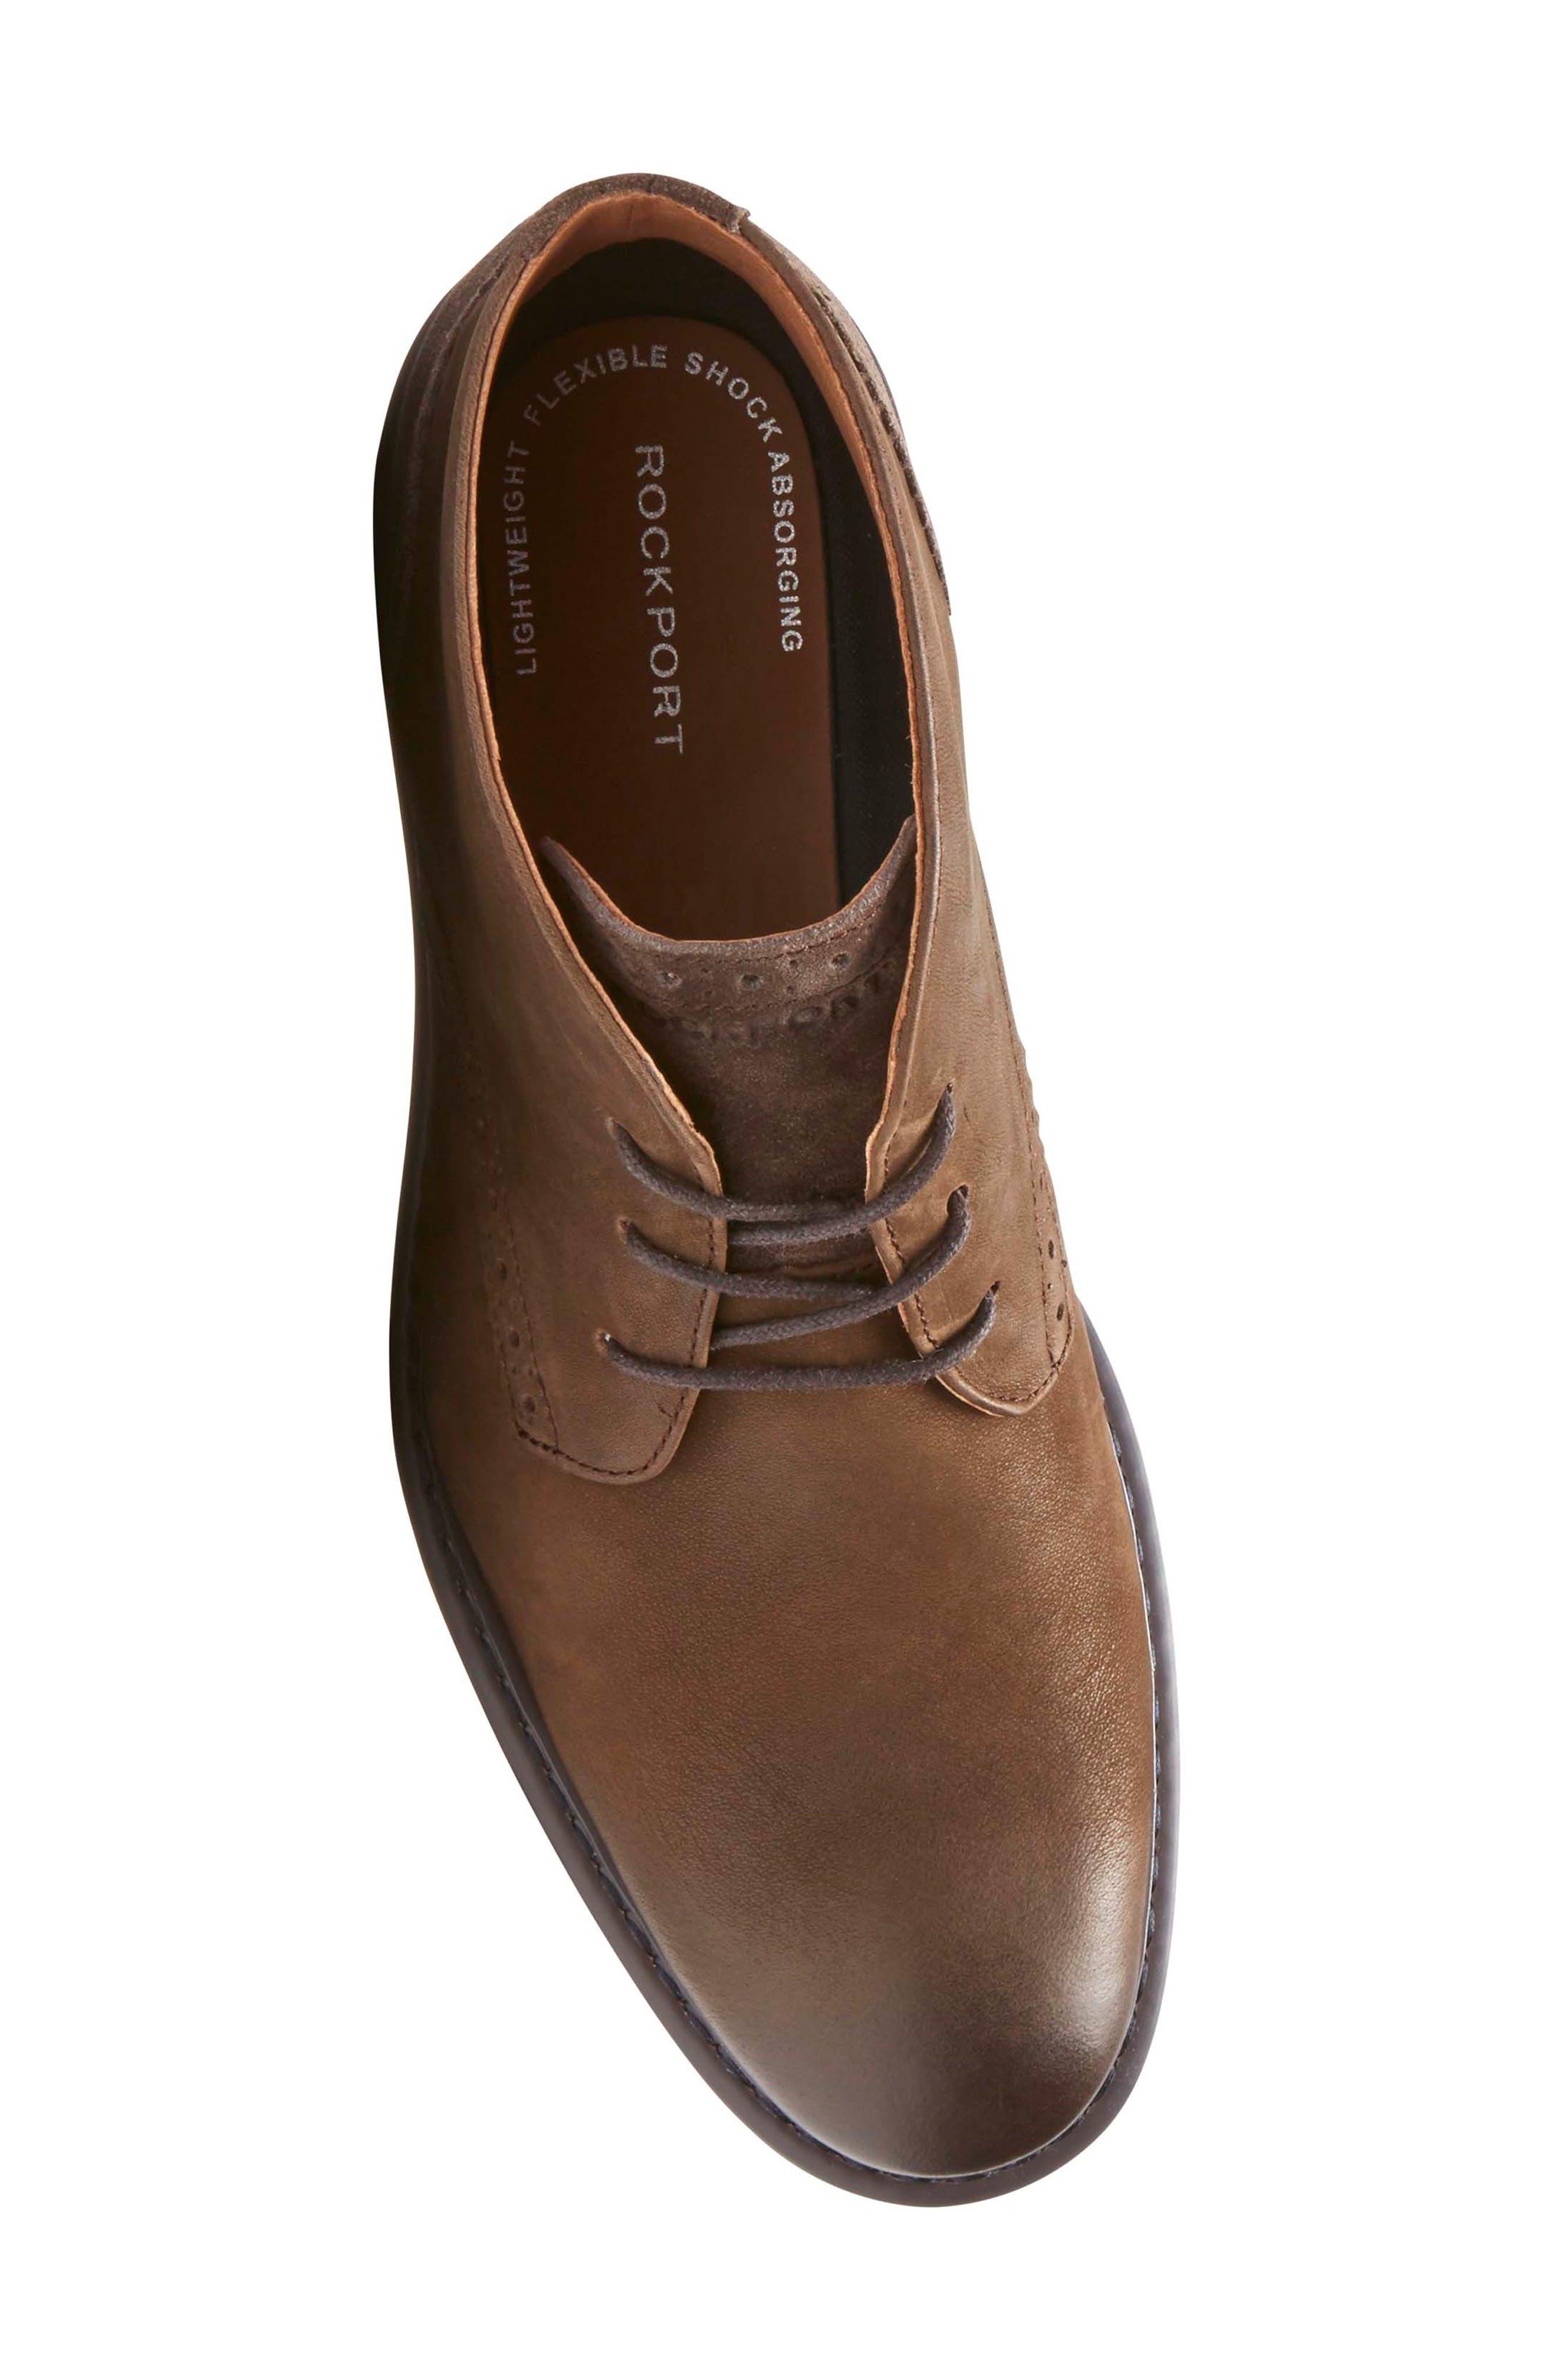 Jaxson Chukka Boot,                             Alternate thumbnail 5, color,                             Brown/ Brown Leather